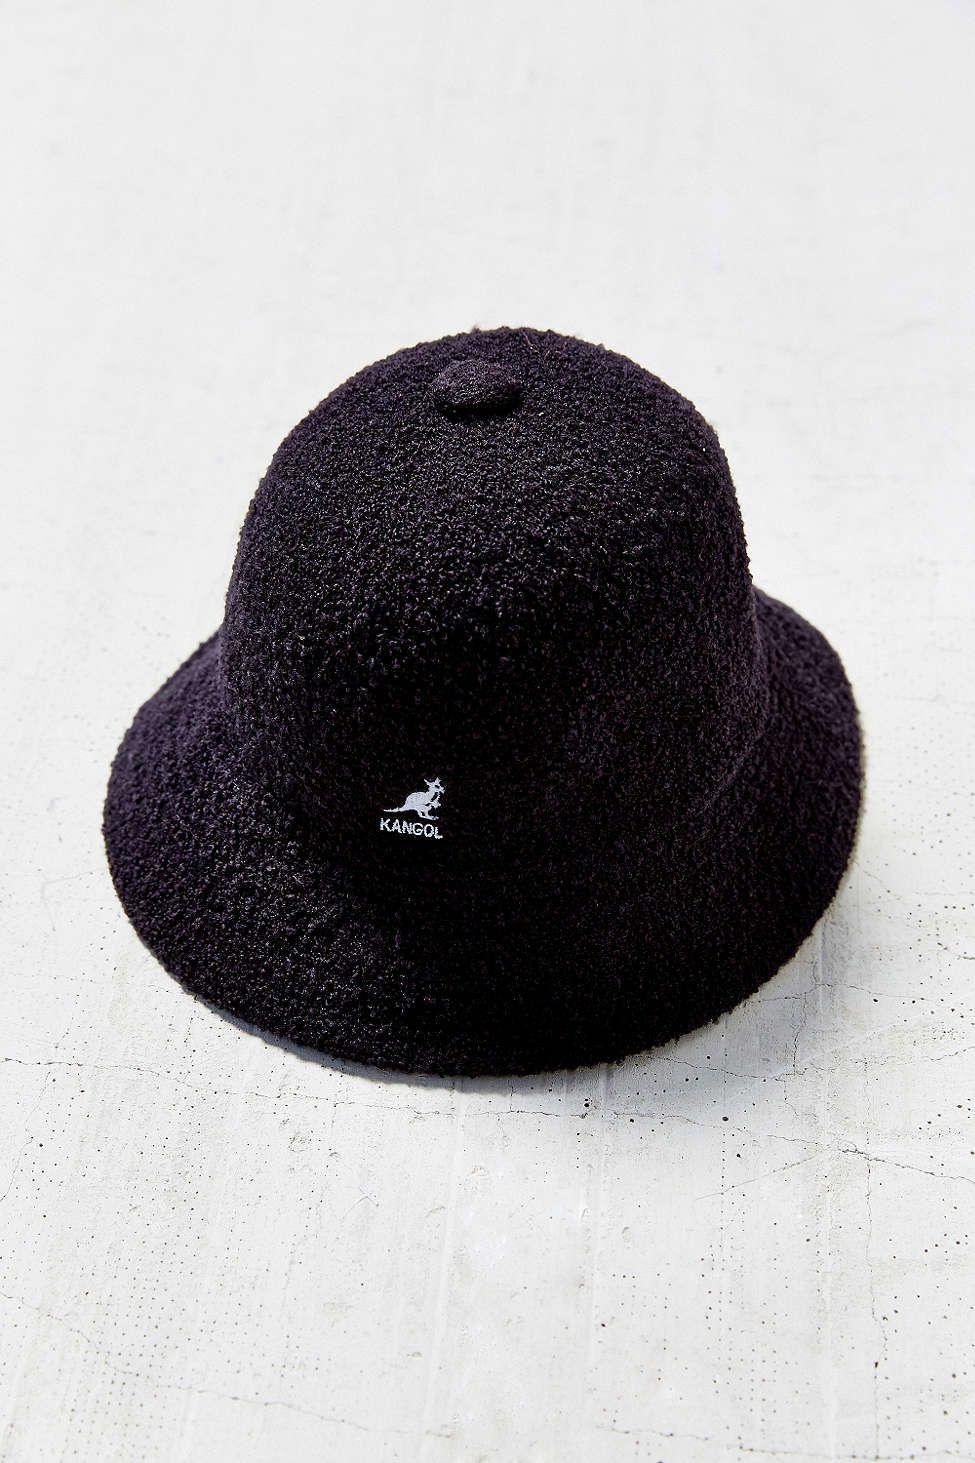 62734b8c689cb Kangol Winter Bermuda Bucket Hat